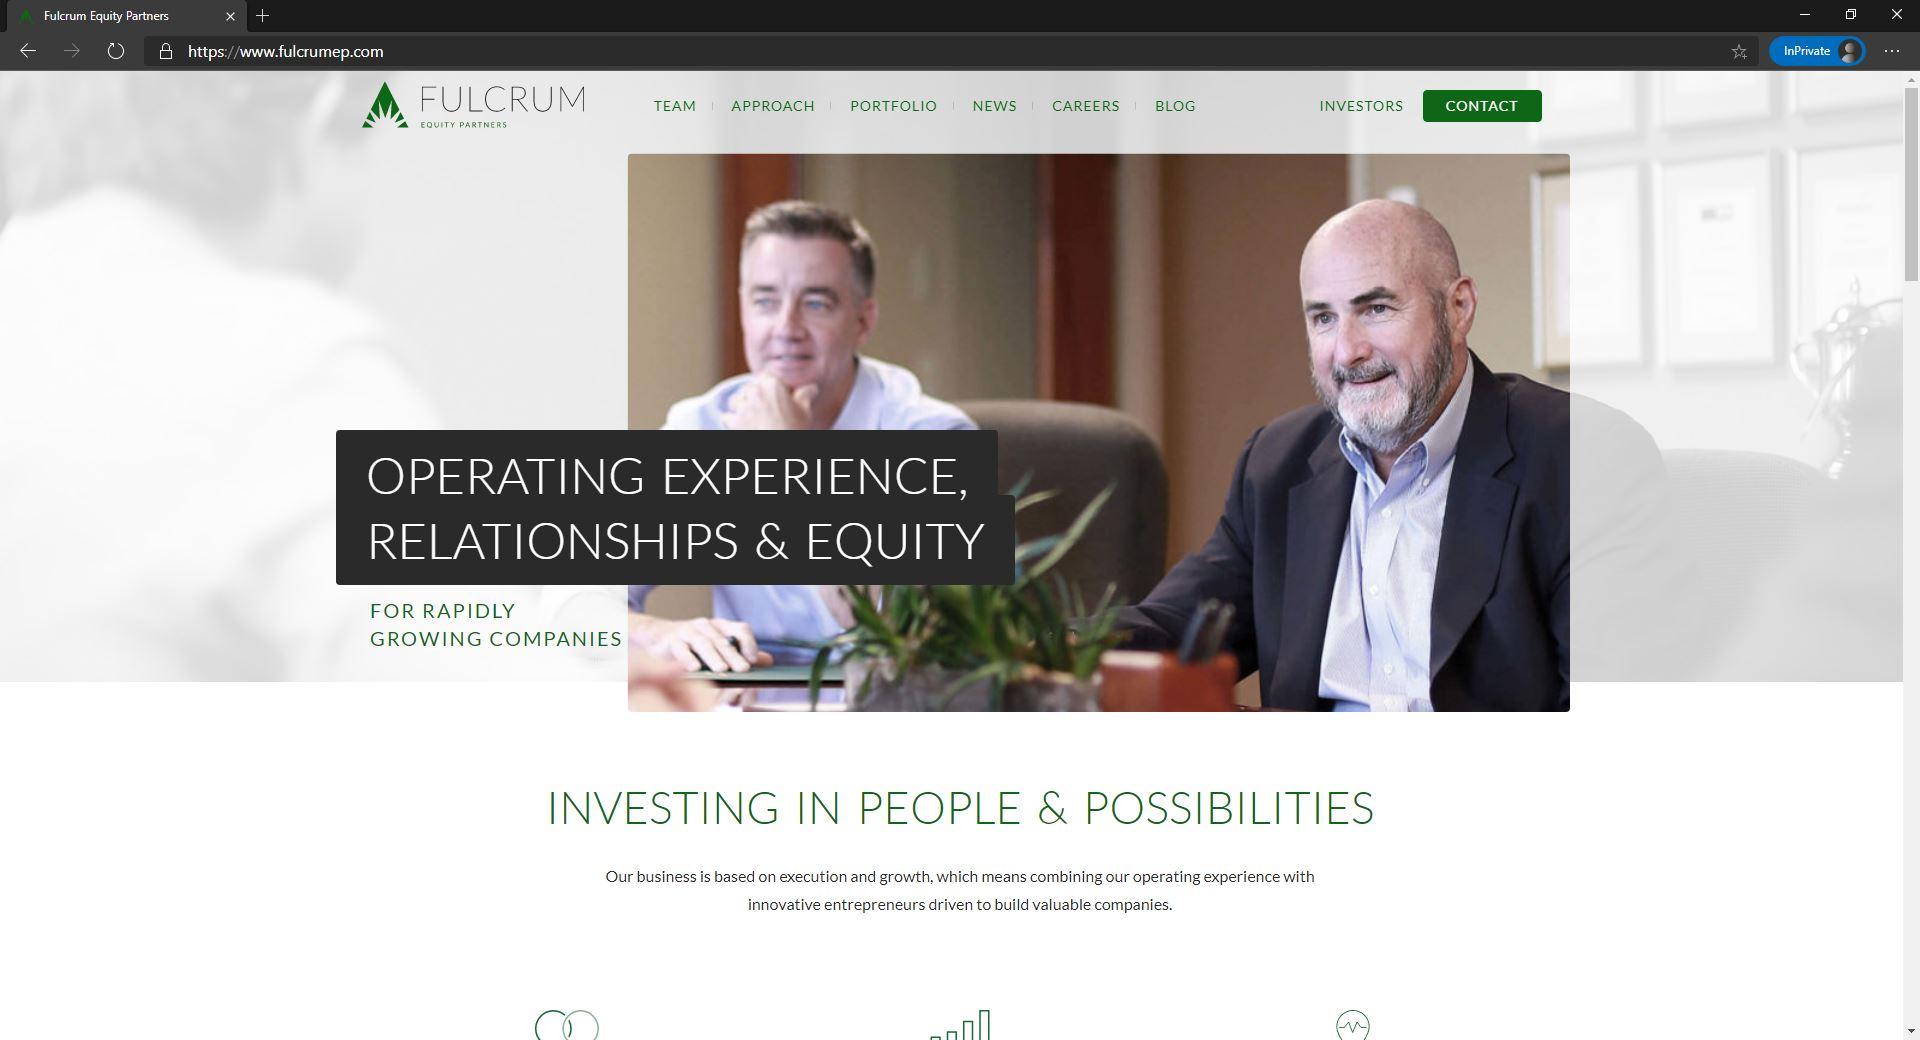 Fulcrum Equity Partners website homepage